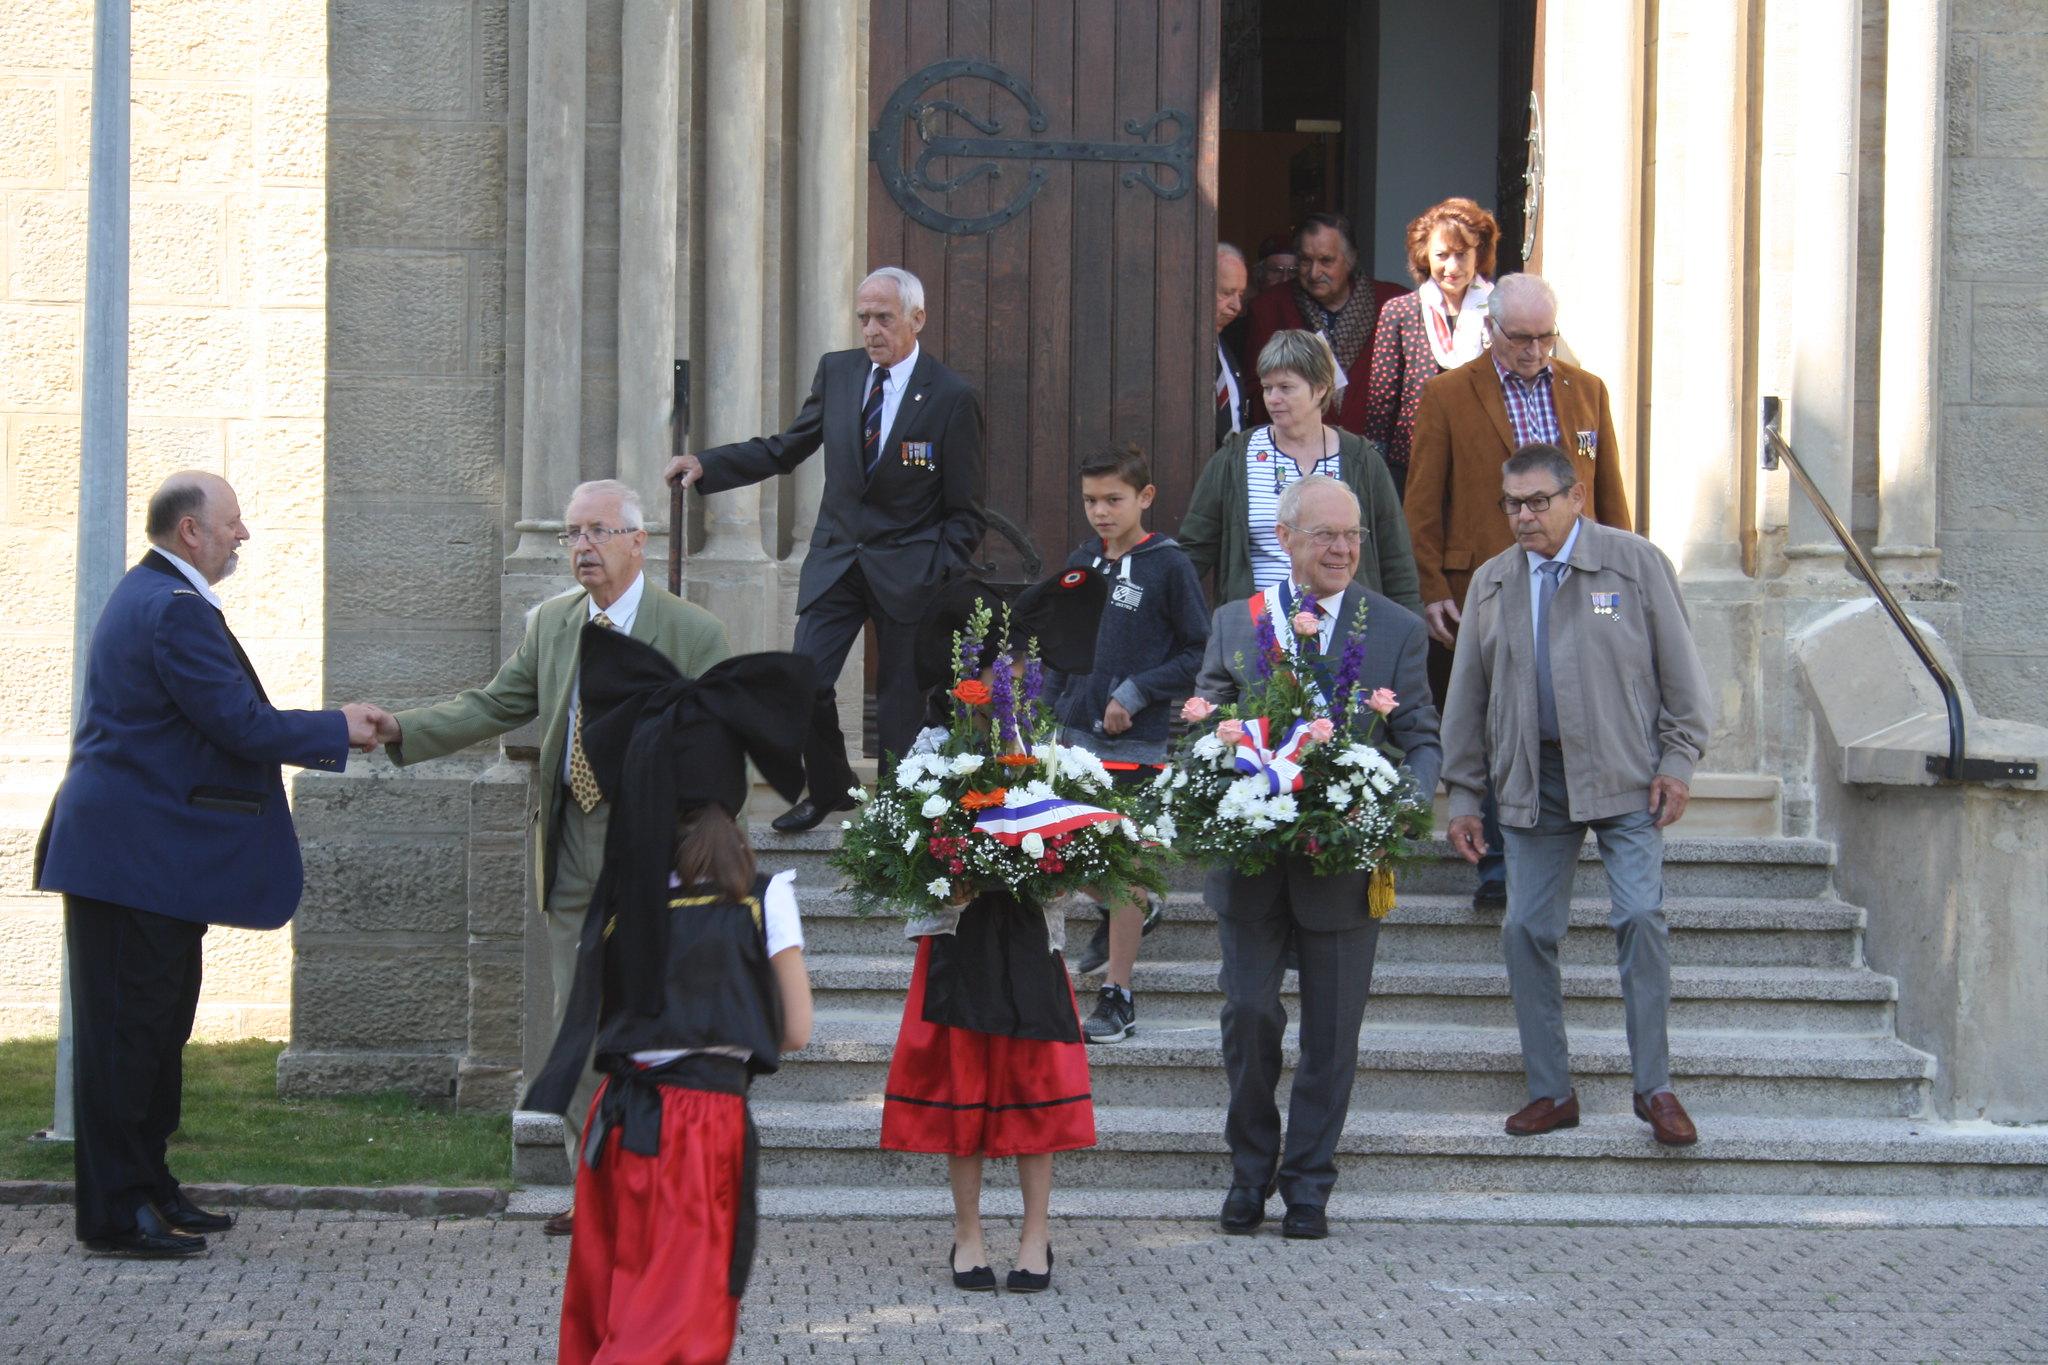 Cérémonie Commémorative du 8 Mai